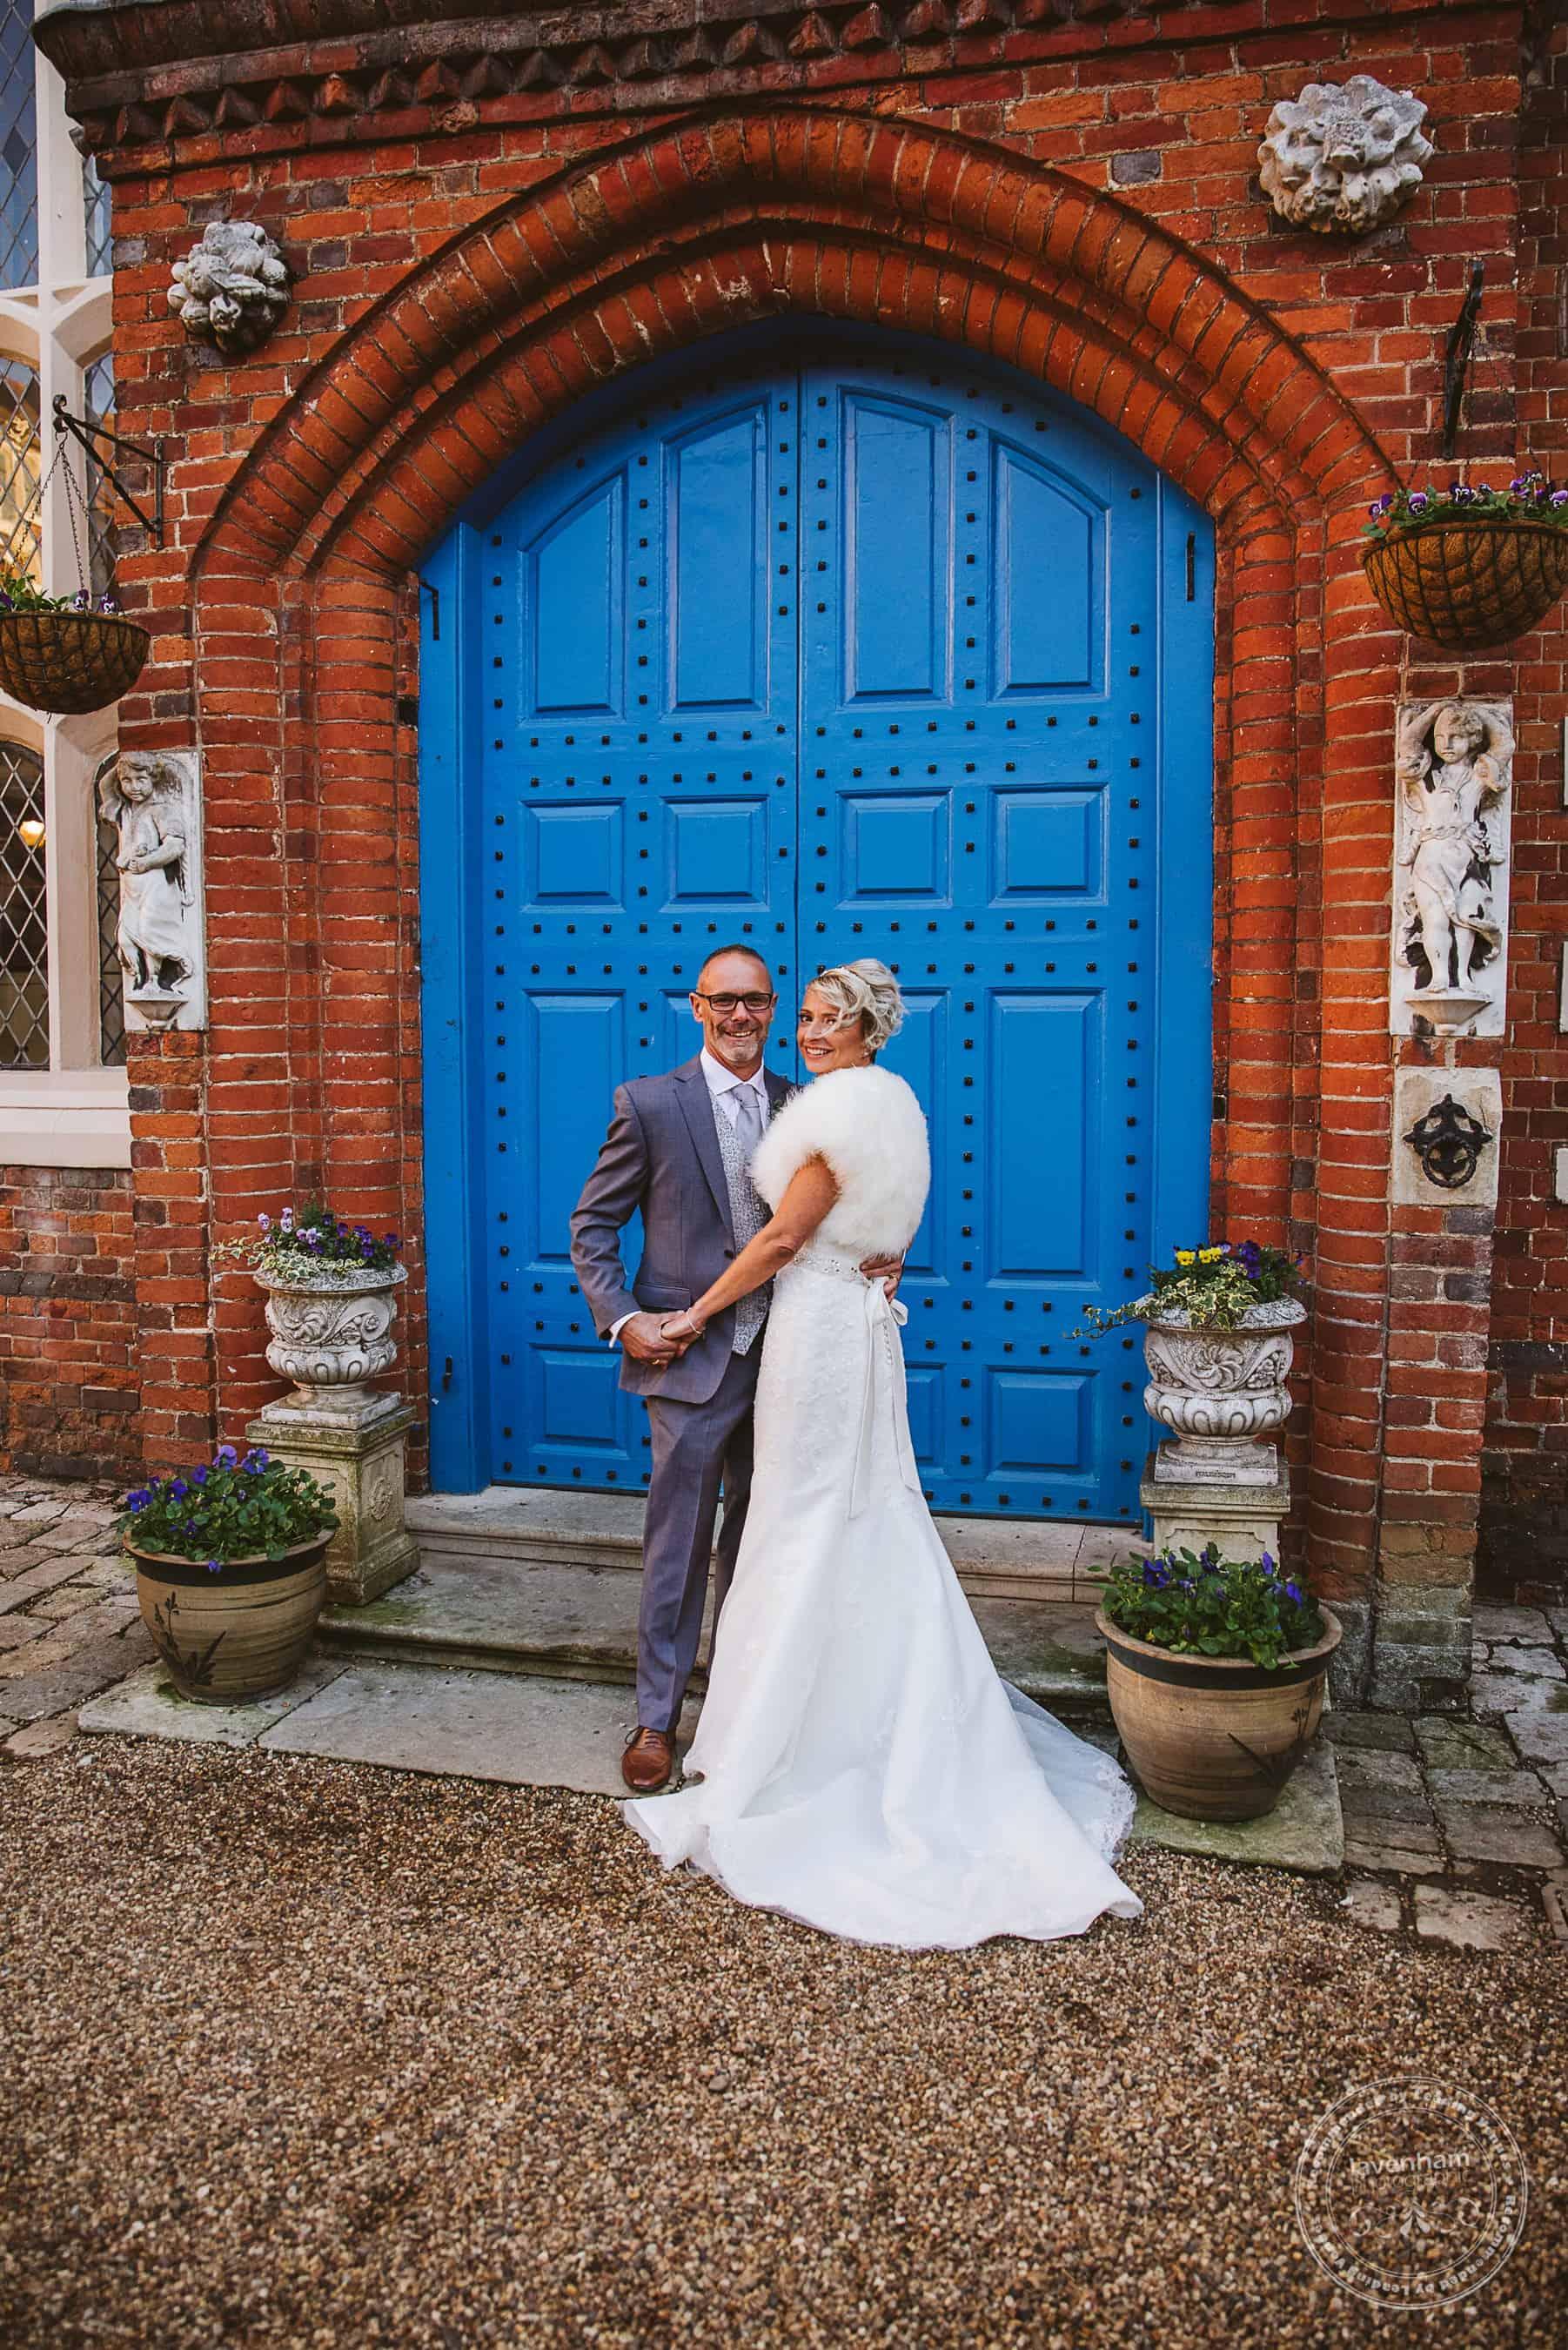 281018 Gosfield Hall Wedding Photography Lavenham Photographic 068